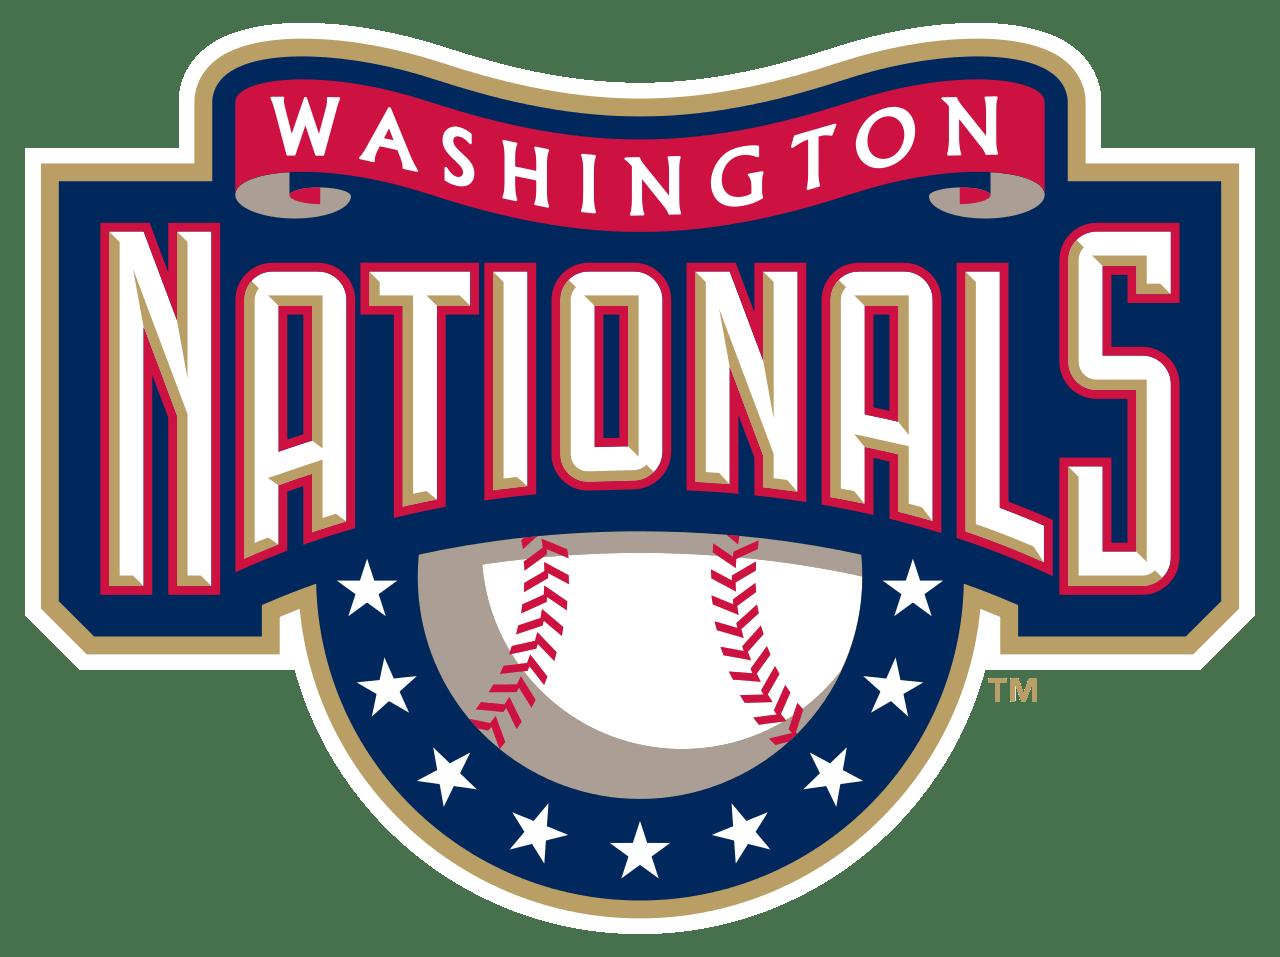 Washington Nationals Logo Sign transparent PNG.